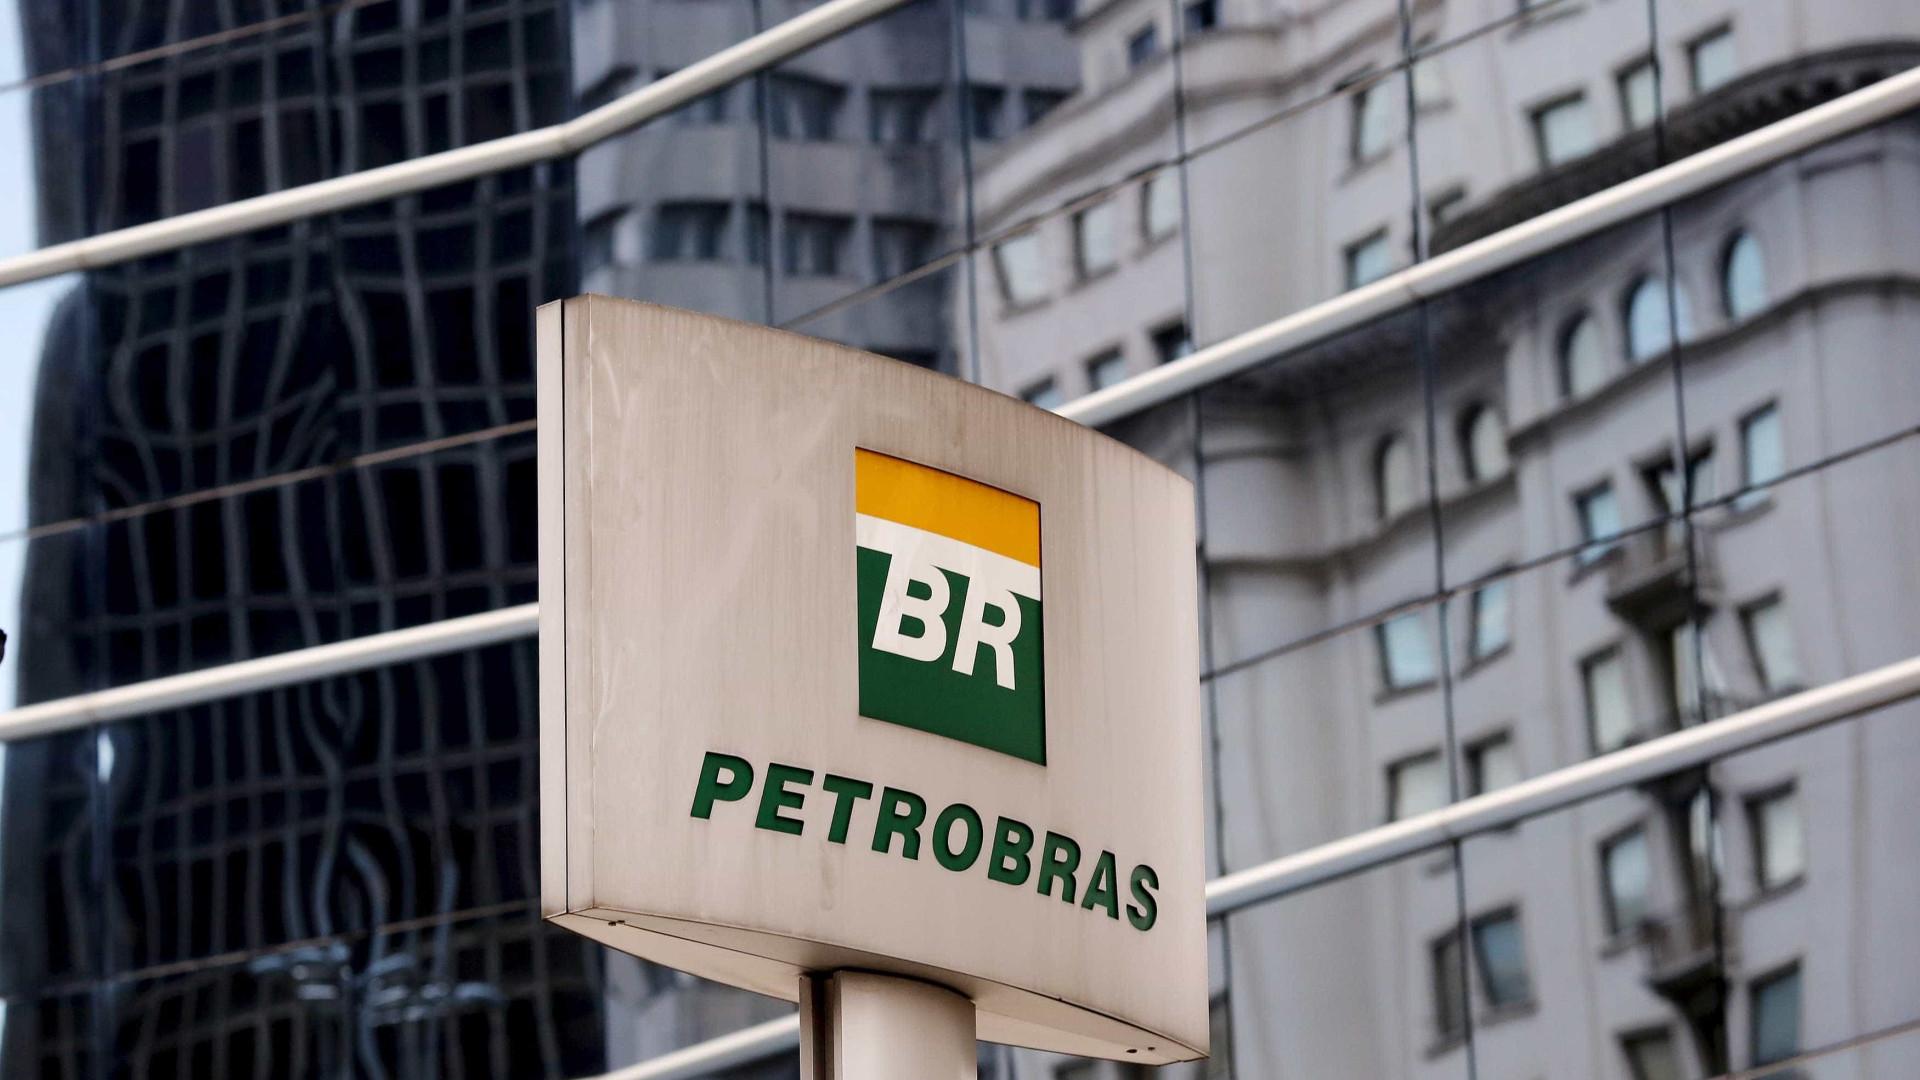 Petrobras já recuperou R$ 2,5 bilhões desde 2015, diz Lava Jato